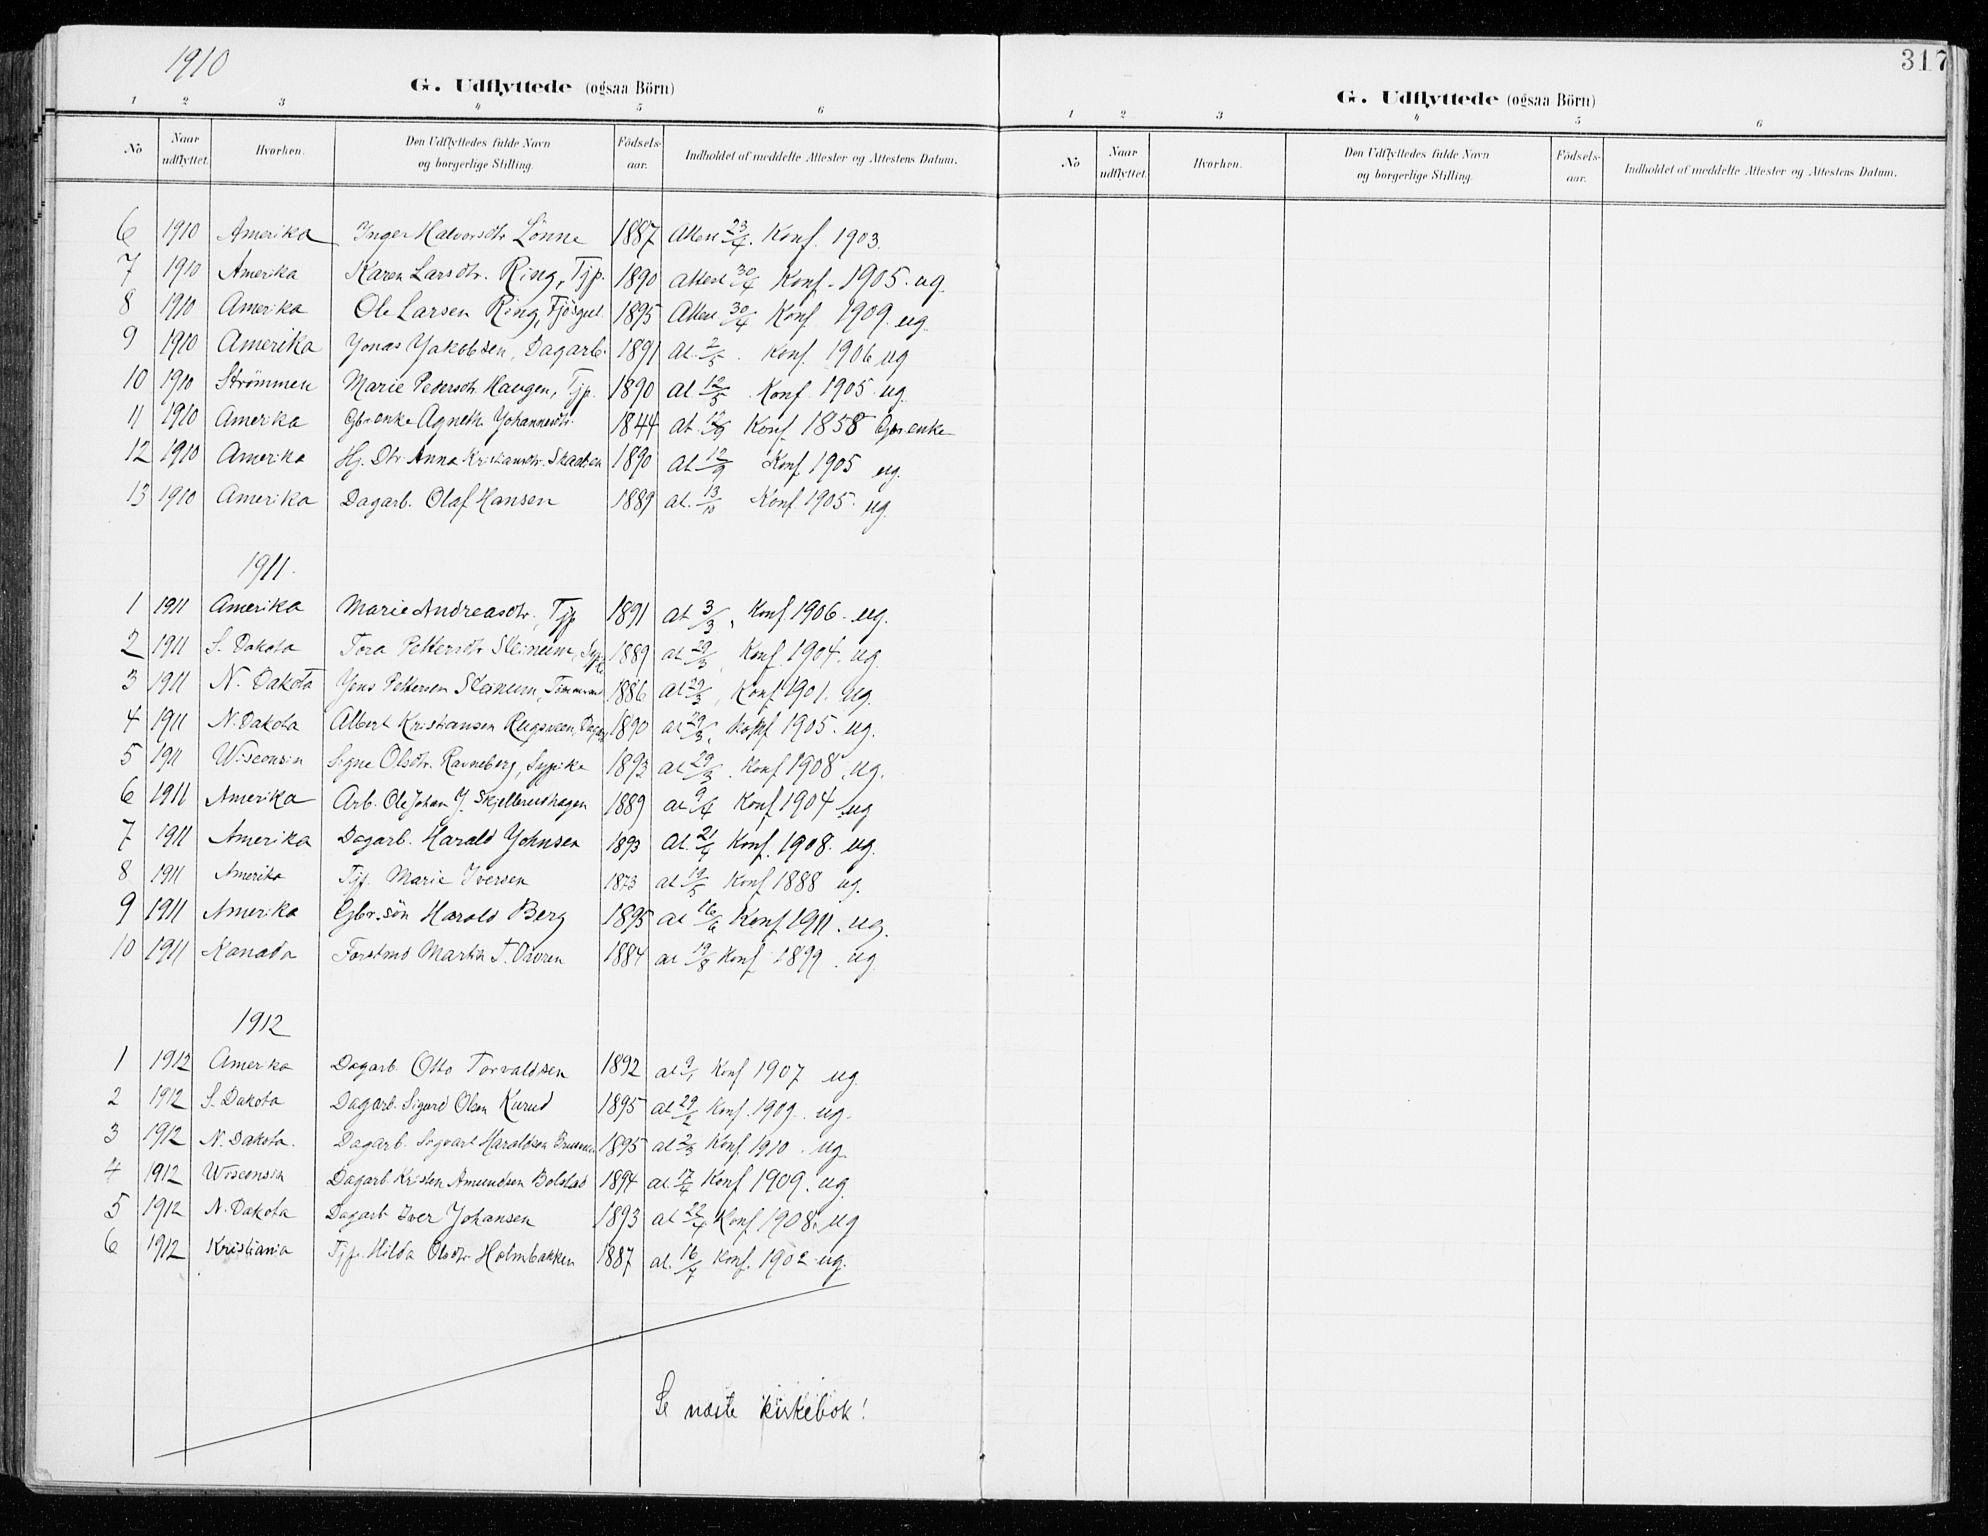 SAH, Fåberg prestekontor, Ministerialbok nr. 11, 1899-1913, s. 317